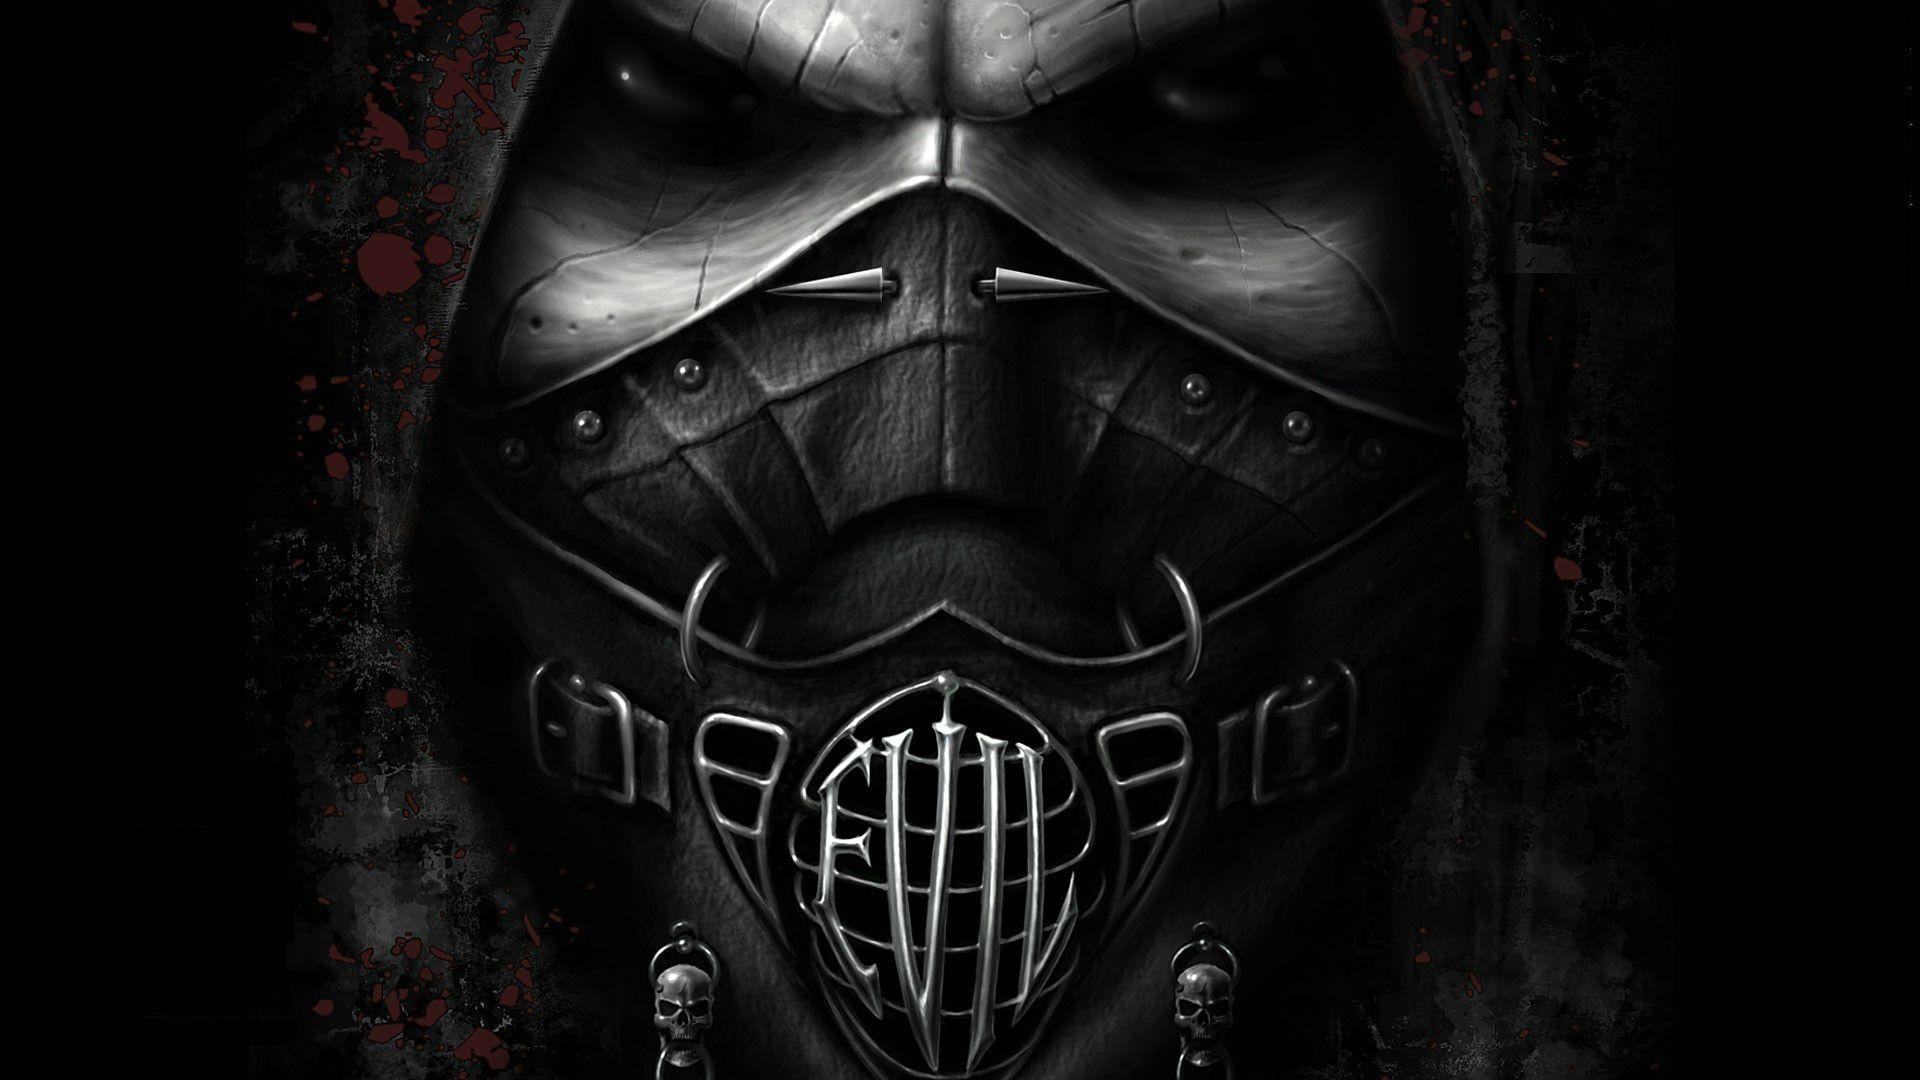 Wallpaperdark Gothicfun Stock Images Hd Mask Evil